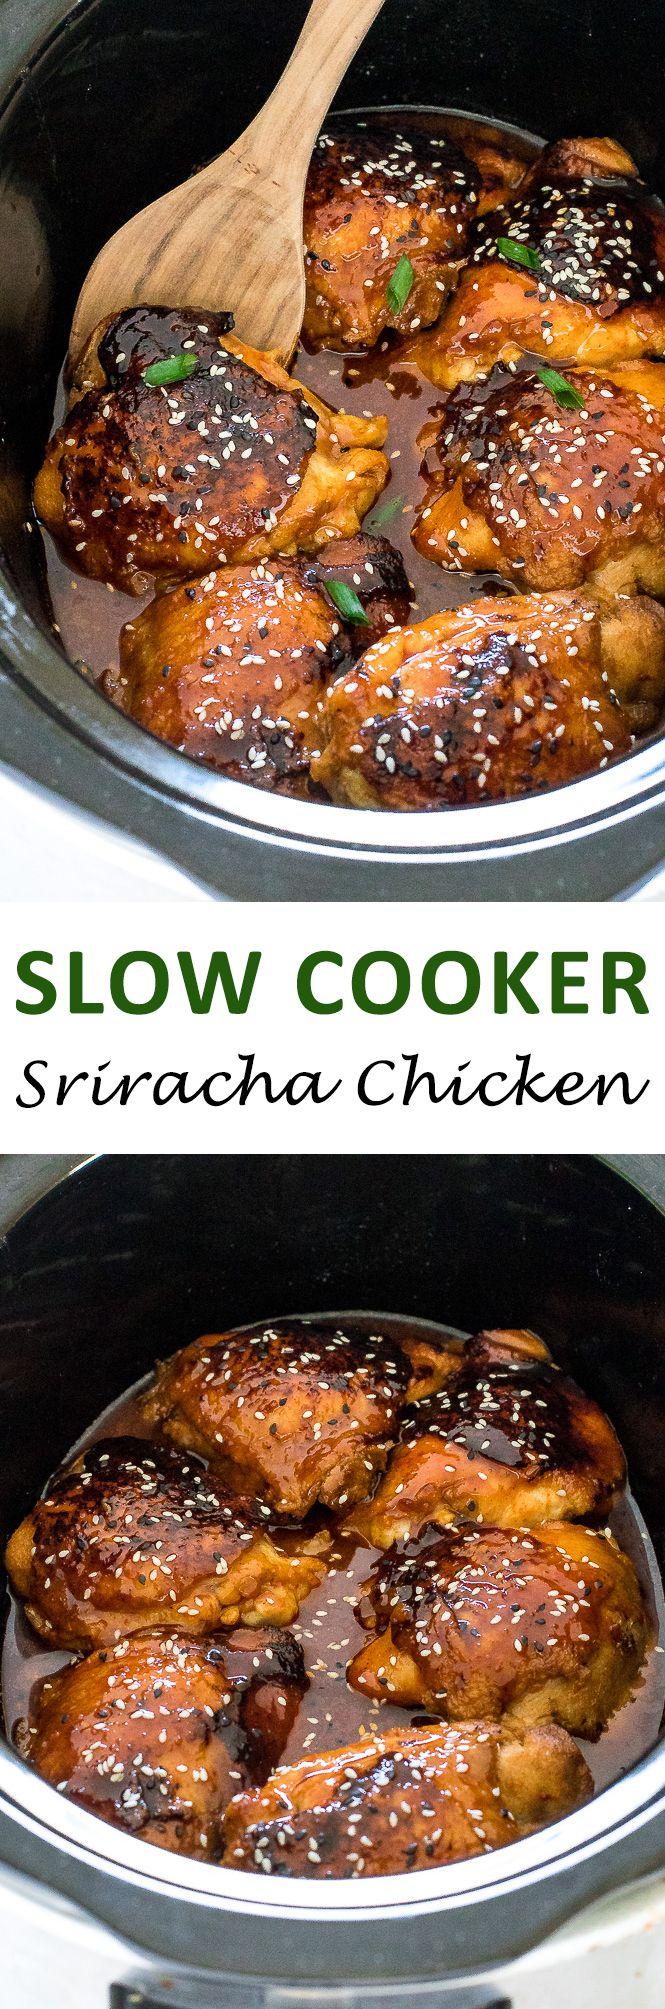 Slow Cooker Honey Sriracha Chicken. Super tender chicken thighs cooked low and slow in a honey garlic sriracha sauce.   chefsavvy.com #recipe #slow #cooker #sriracha #chicken #dinner